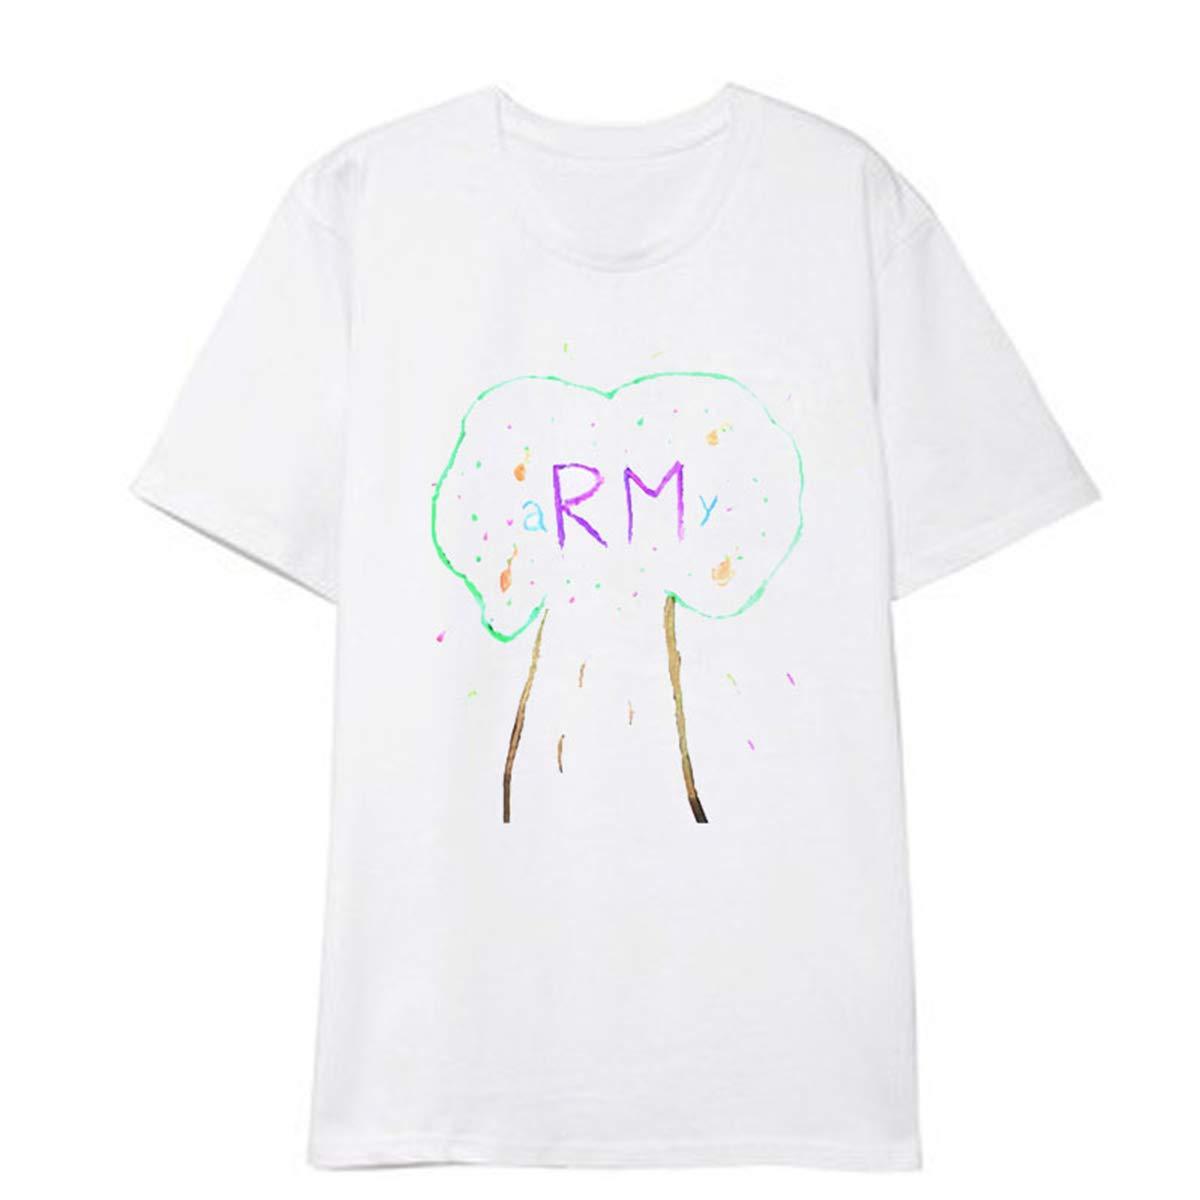 SIMYJOY Unisex BTS Konzert Tour Fan Unterst/ützung Bunte Graffiti T-Shirt Top Mode F/ür Amy Jin Suga J-Hope RM Jimin V Jung Kook